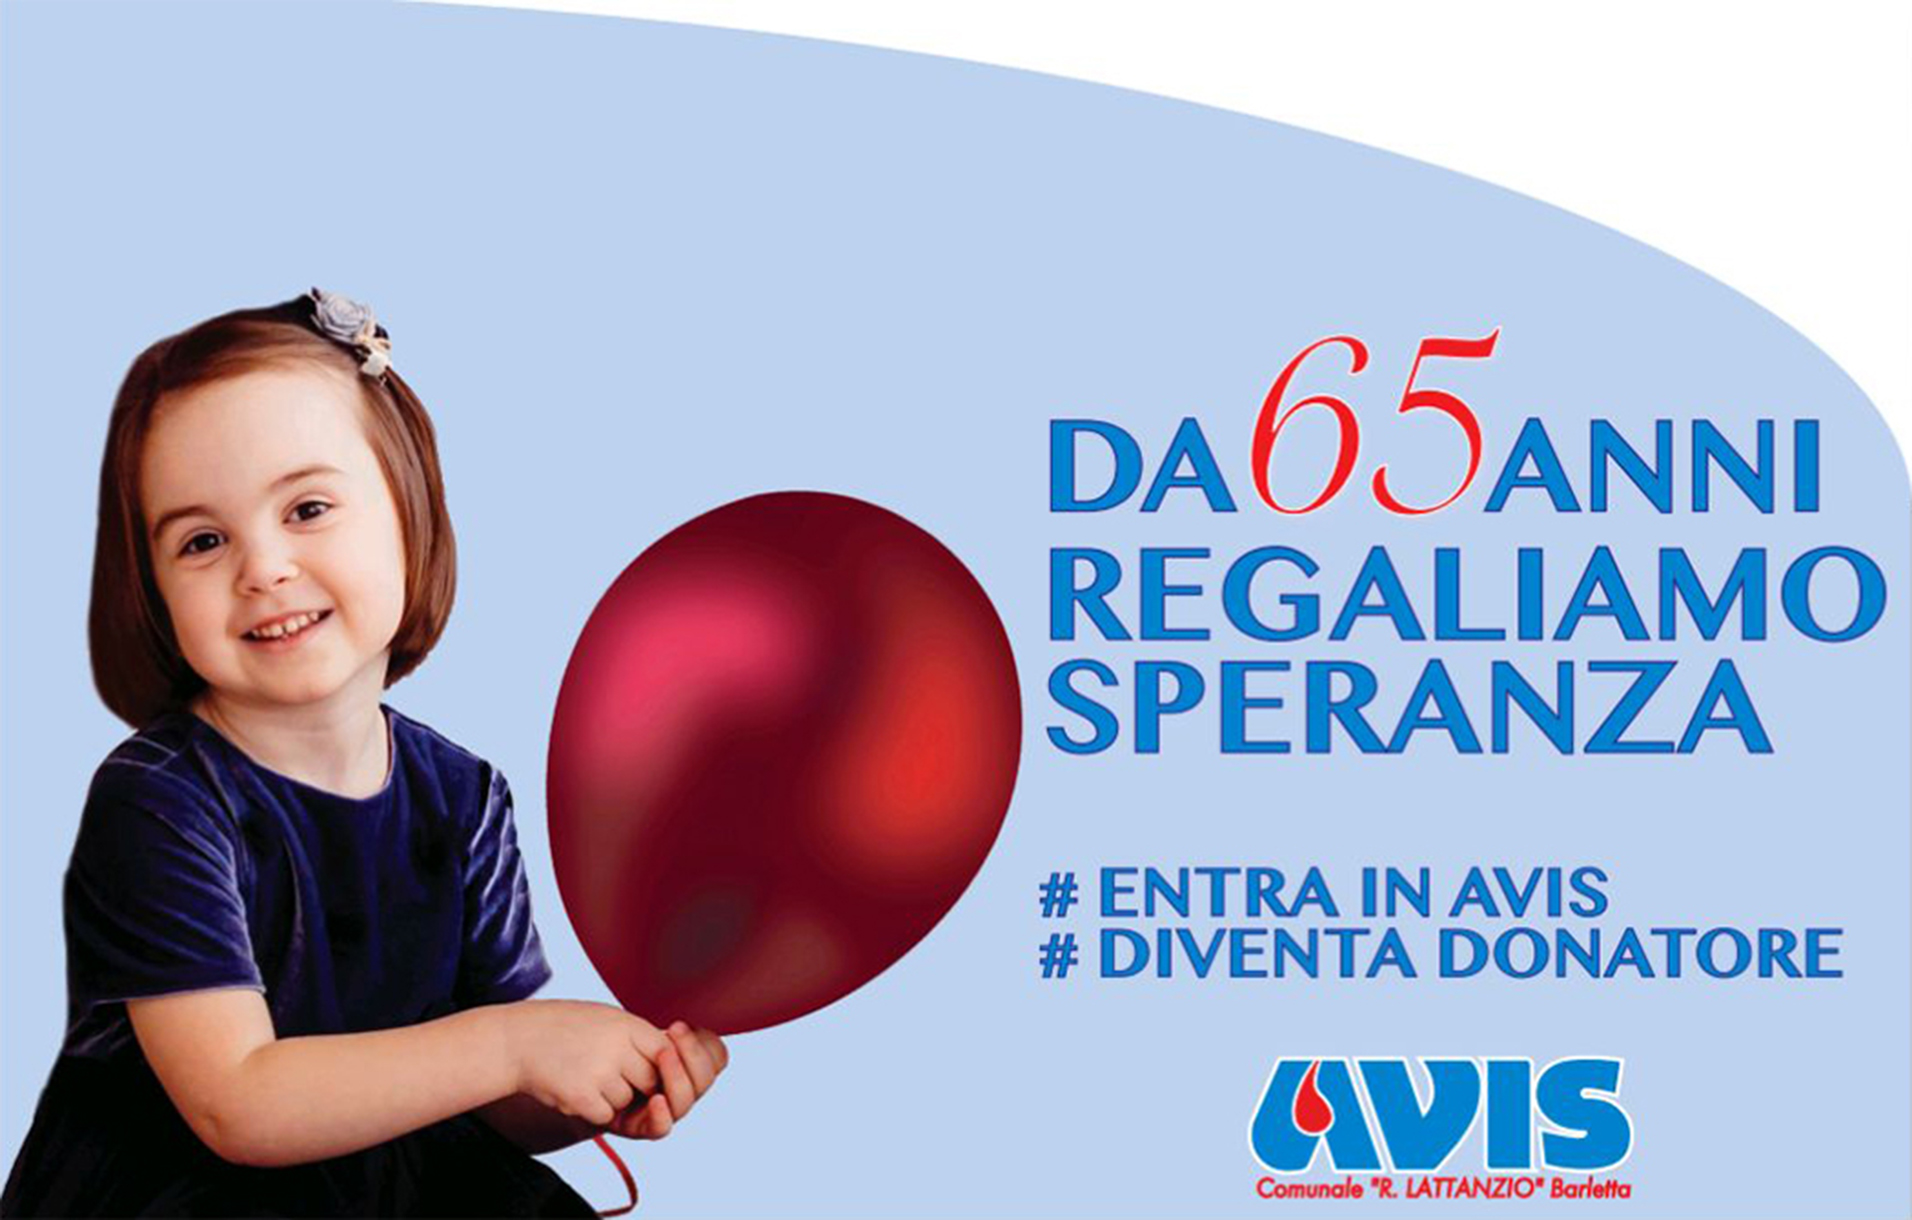 http://www.avisbarletta.it/wp-content/uploads/2018/02/da-65-anni-regaliamo-speranze_mod-1-1.jpg